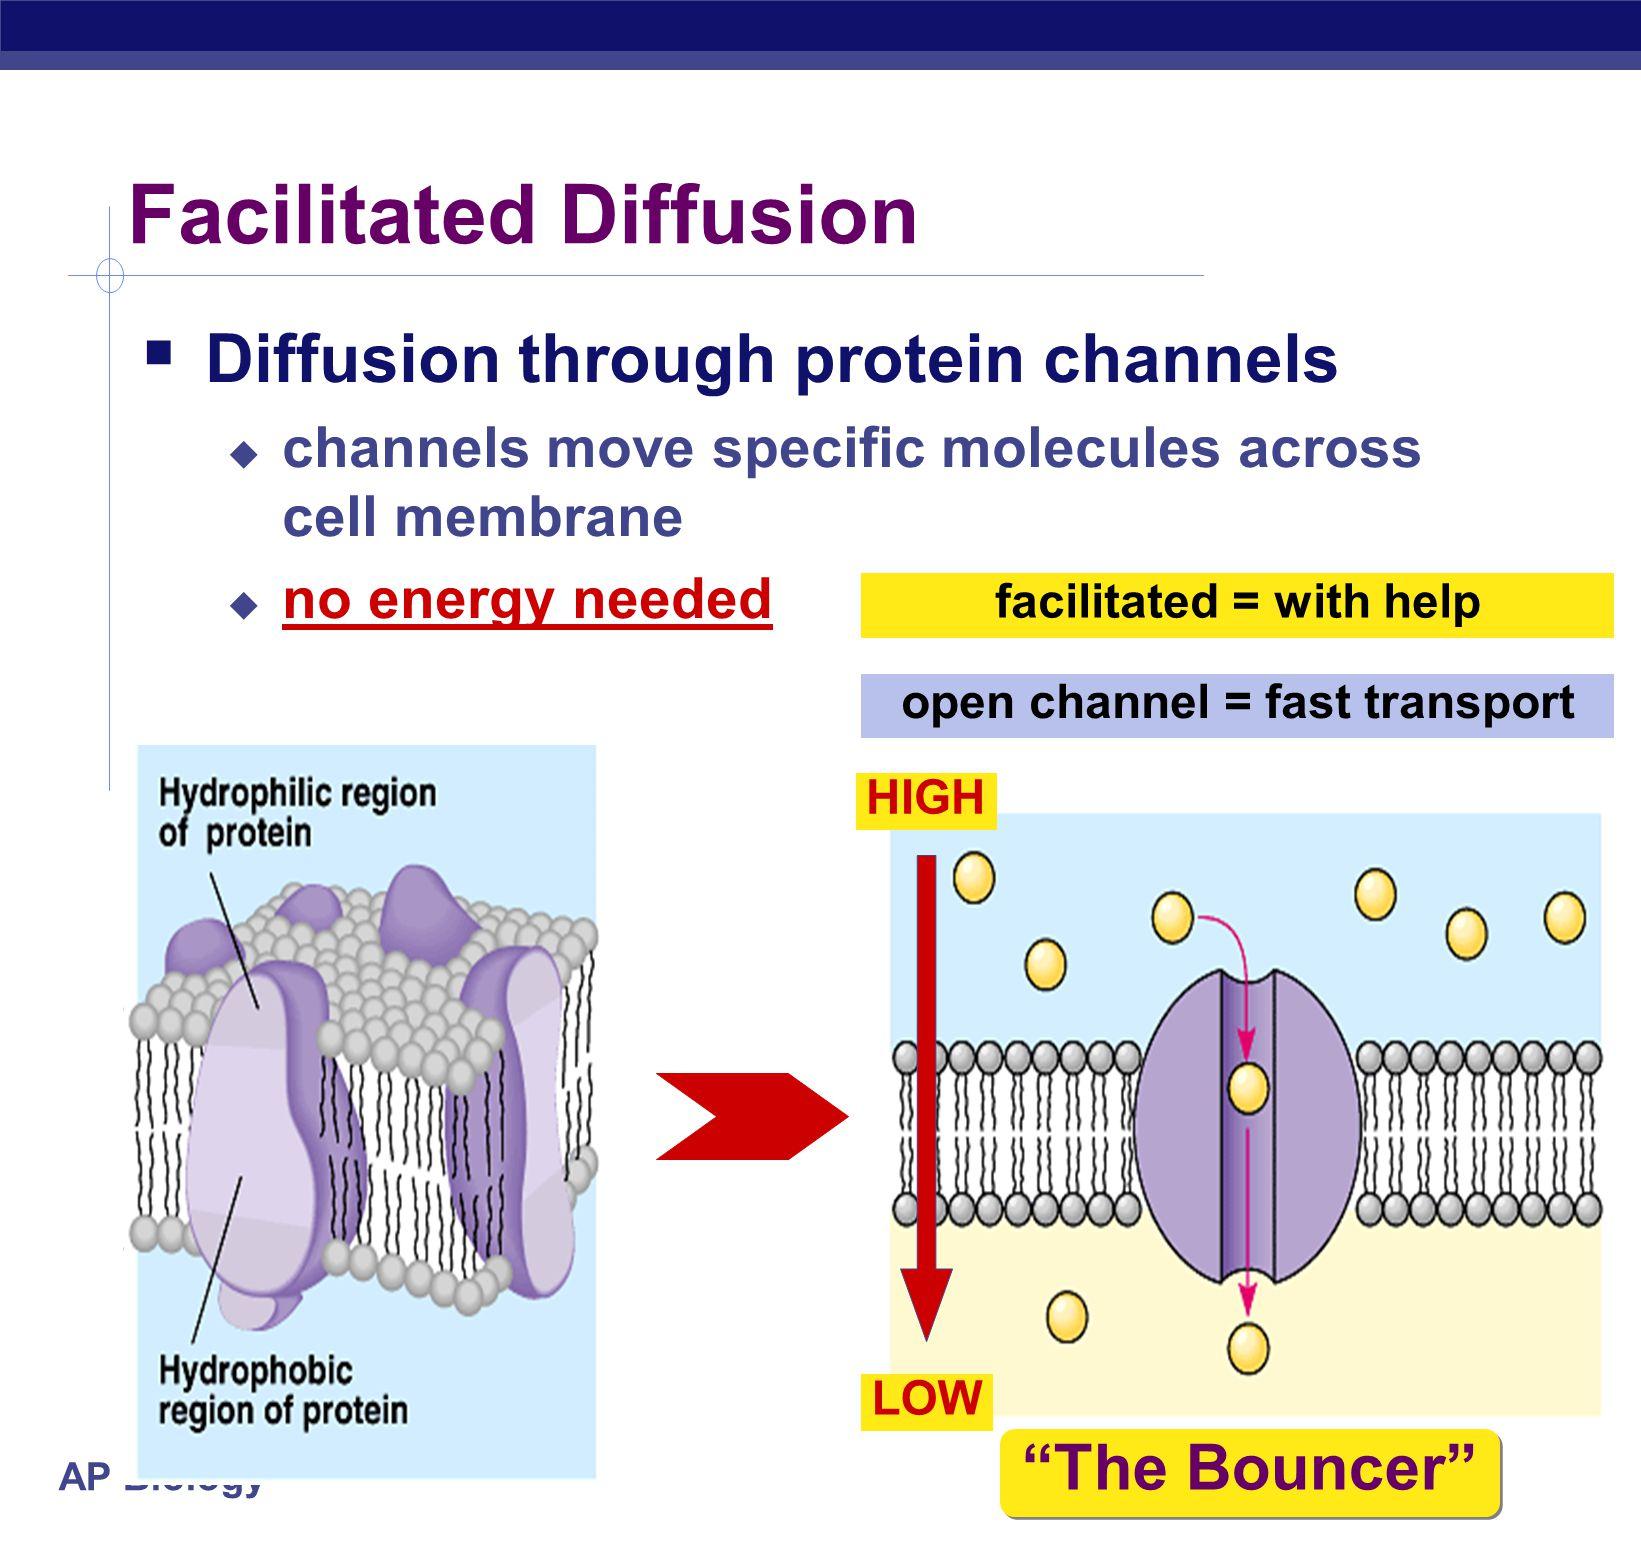 diffusion across cell membrane